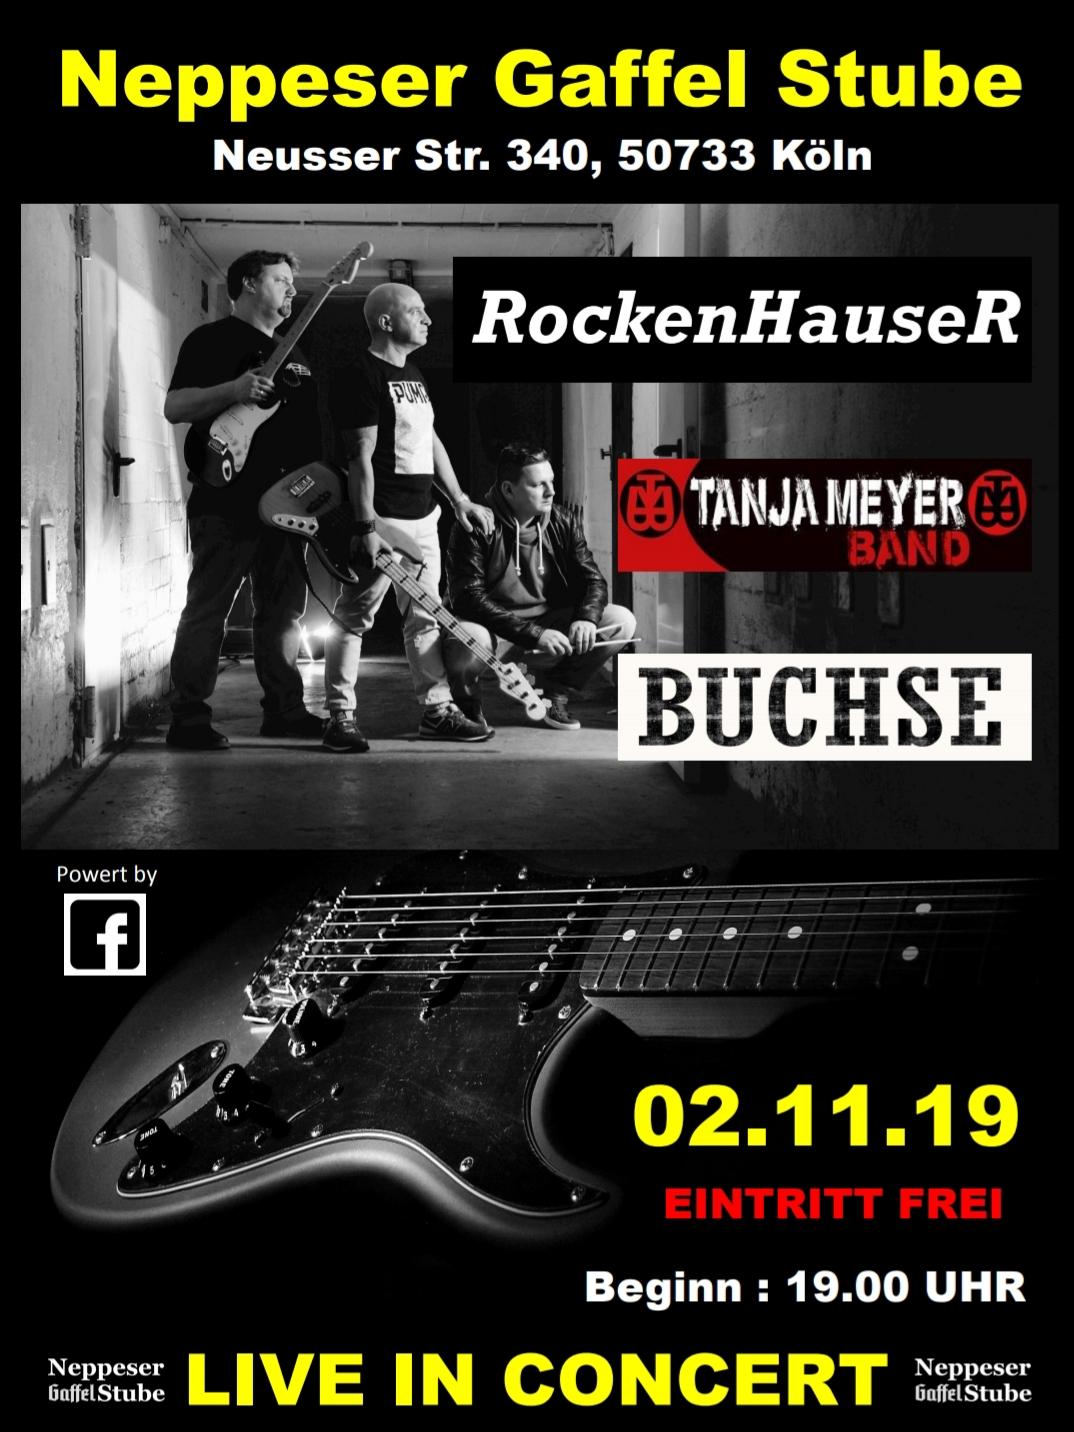 02.11.19 – RockenHauser / Tanja Meyer Band / Buchse Konzert – 19 Uhr